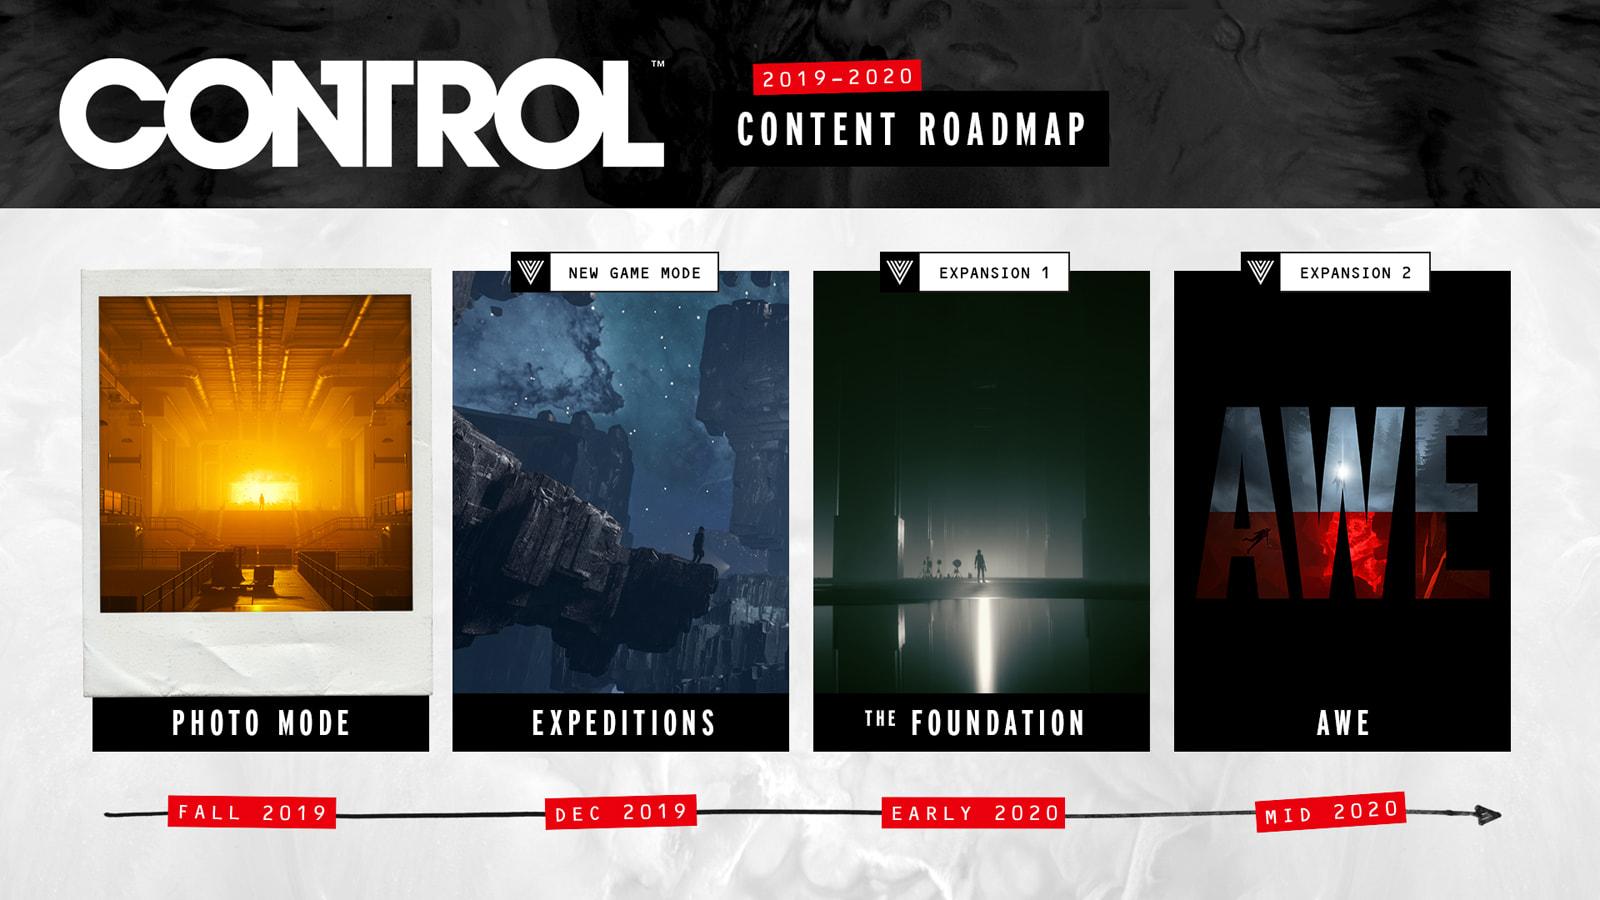 'Control' game roadmap